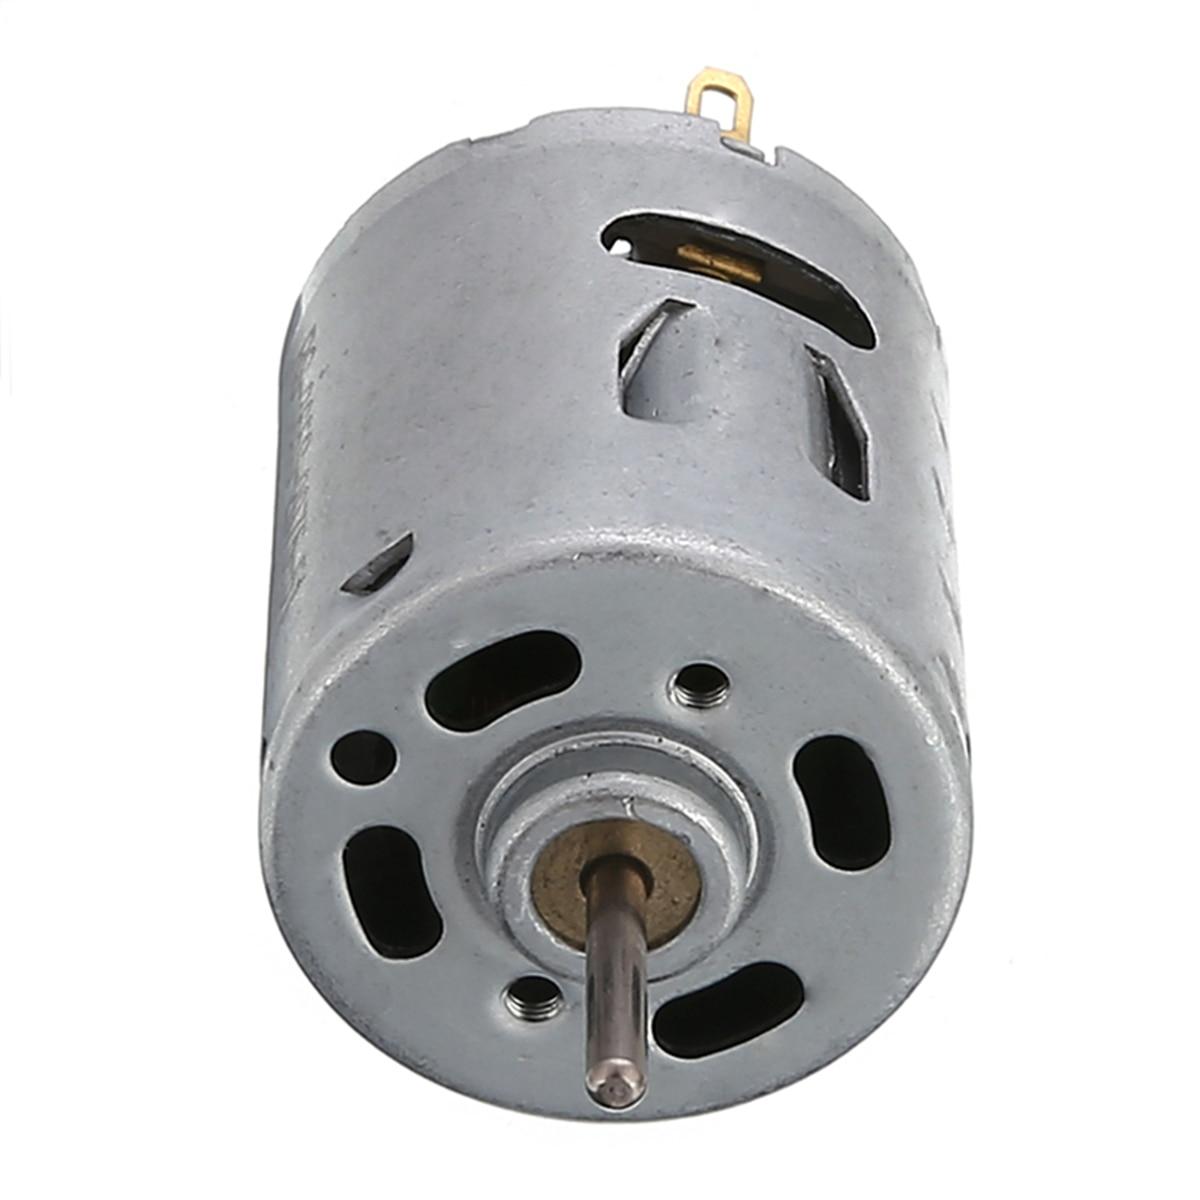 5000RPM DC 6-12V Motor Hobby Mini DC Motor 365 Low Noise For DIY Small Electric Drill Motor DC Motor Diameter 27.5mm